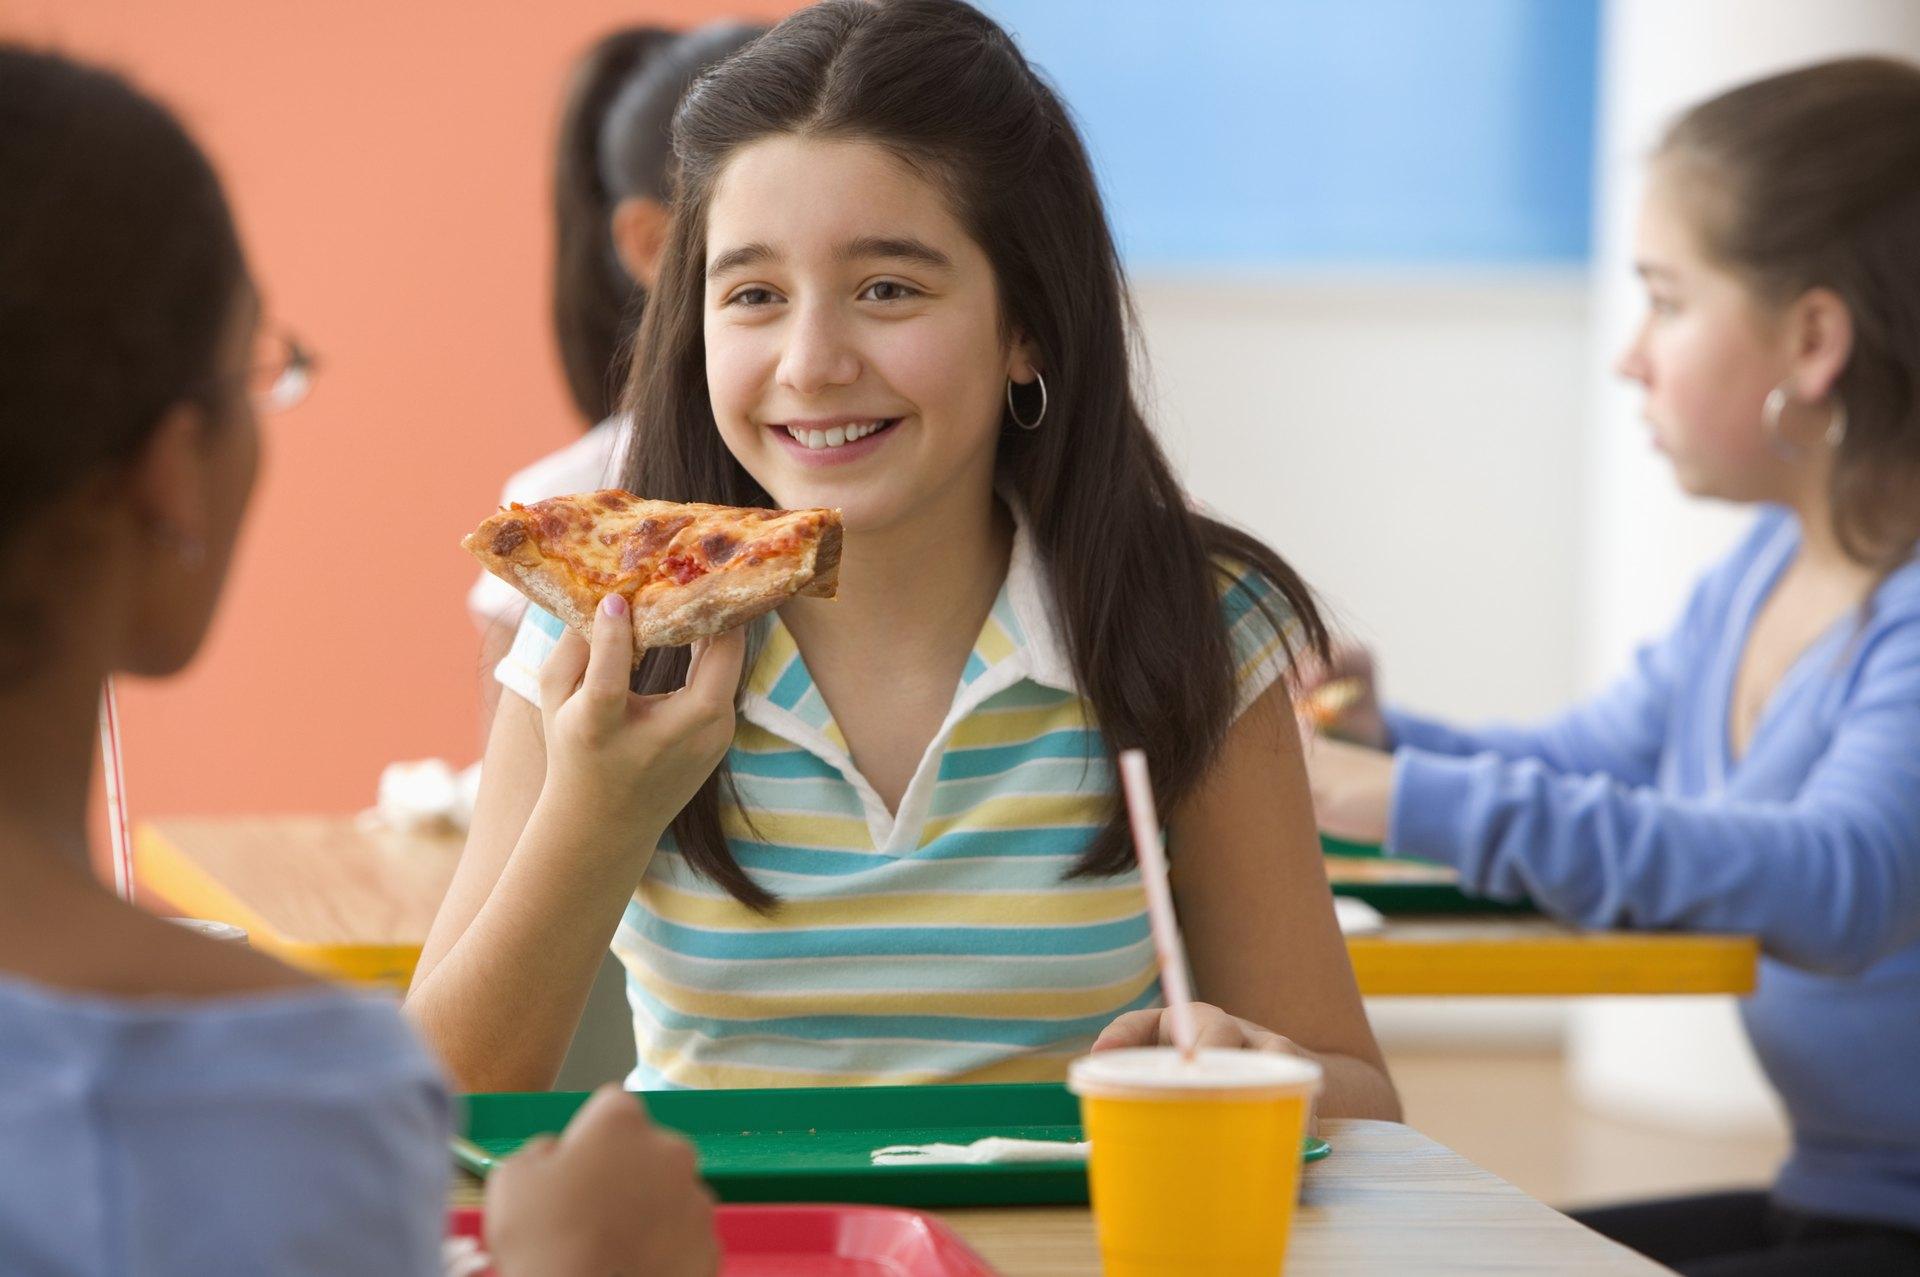 Negative Effects of Junk Food on Kids